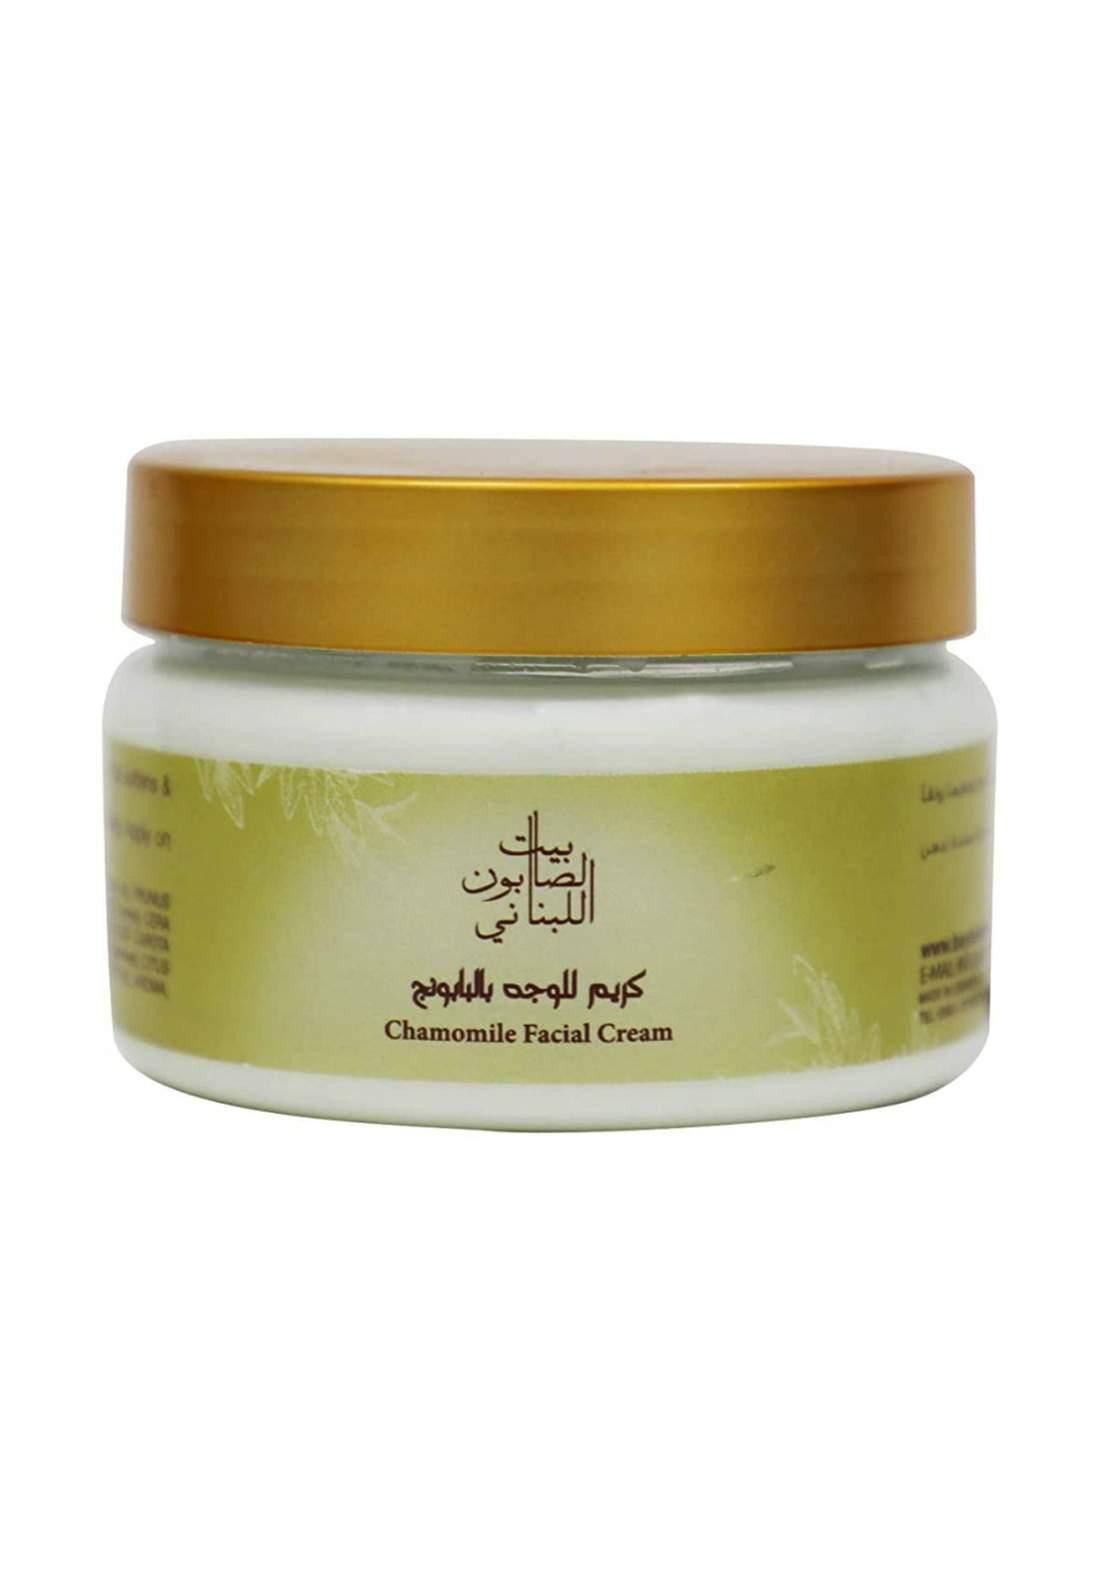 Bayt Alsaboun Alloubnani-317495 Chamomile Facial Cream 150g كريم